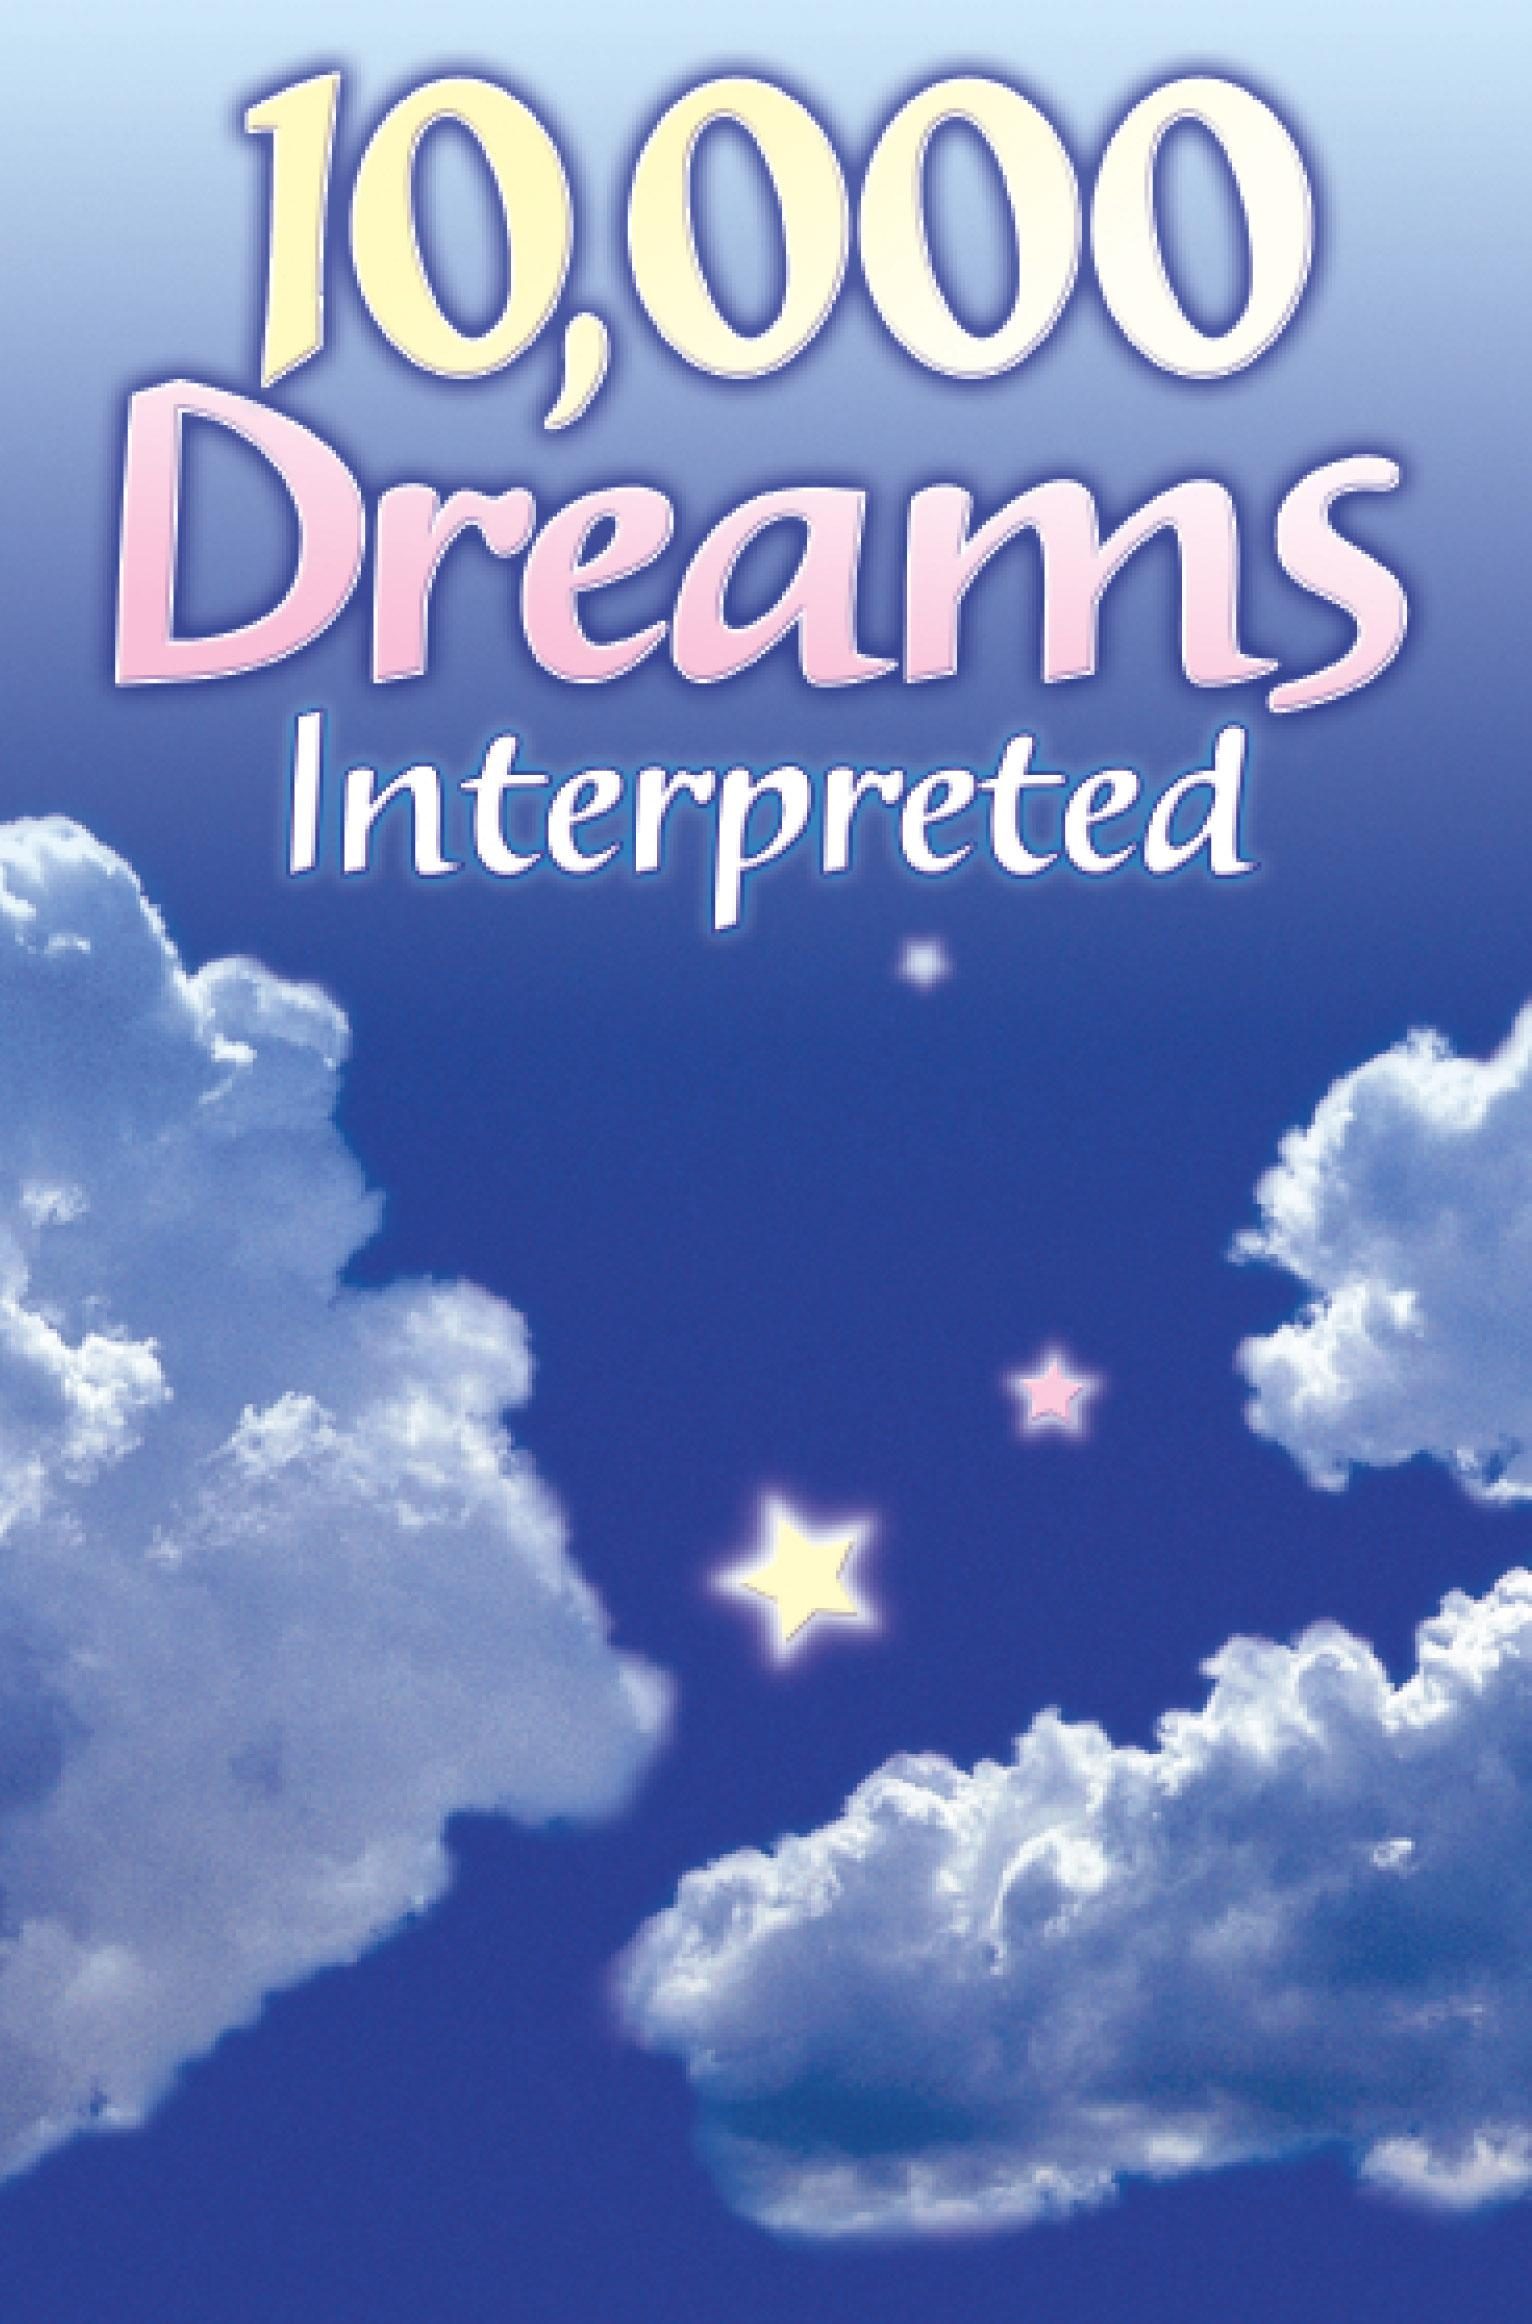 10,000 Dreams Interpreted EB9781848374485